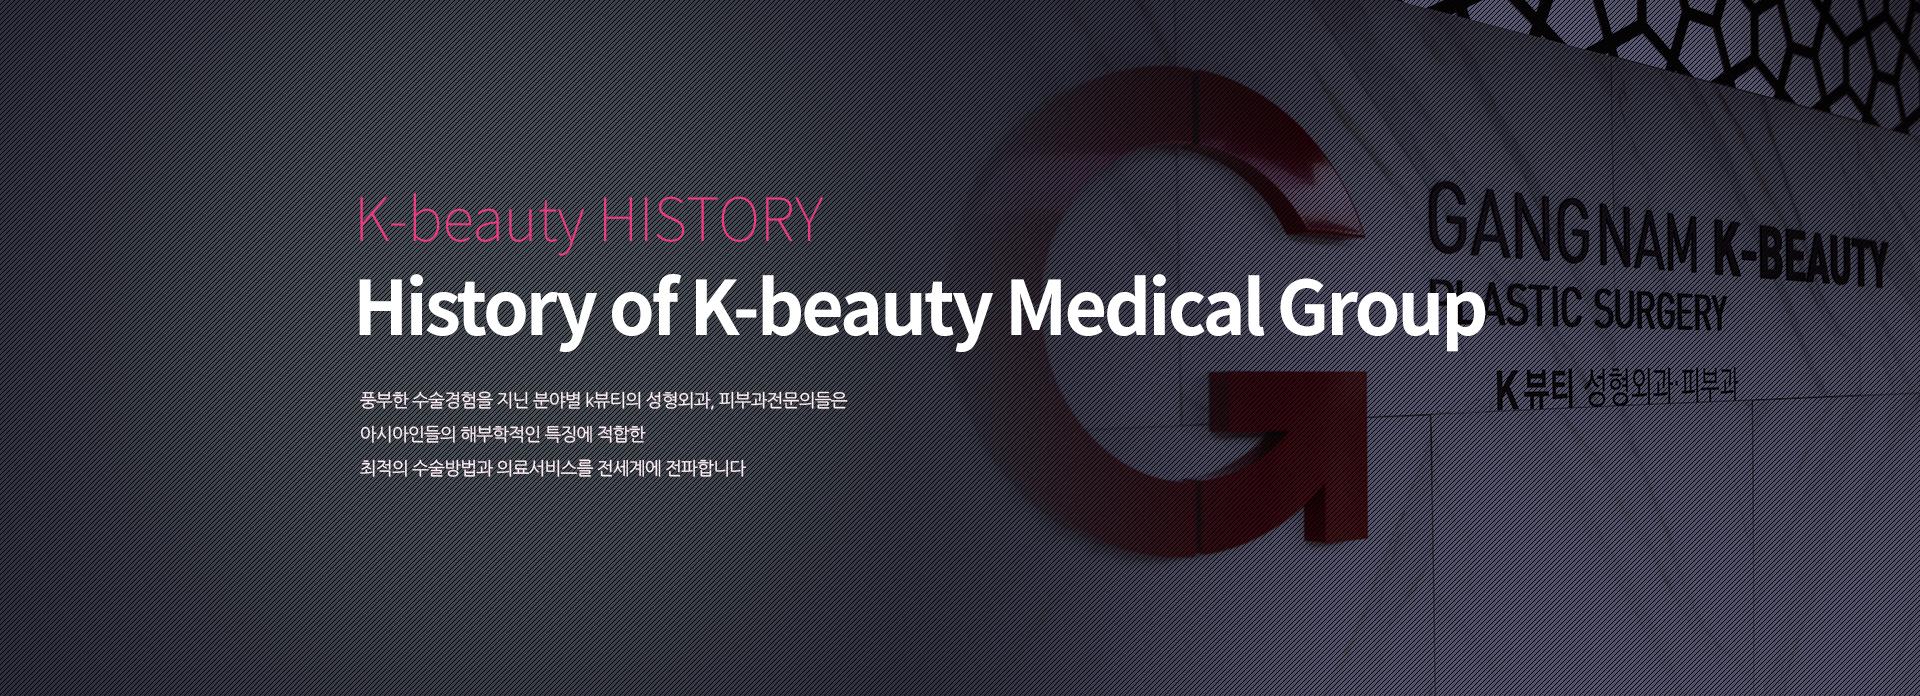 History of GK Medical Group 풍부한 수술경험을 지닌 분야별 강남k뷰티의 성형외과, 피부과전문의들은 아시아인들의 해부학적인 특징에 적합한 최적의 수술방법과 의료서비스를 전세계에 전파합니다.